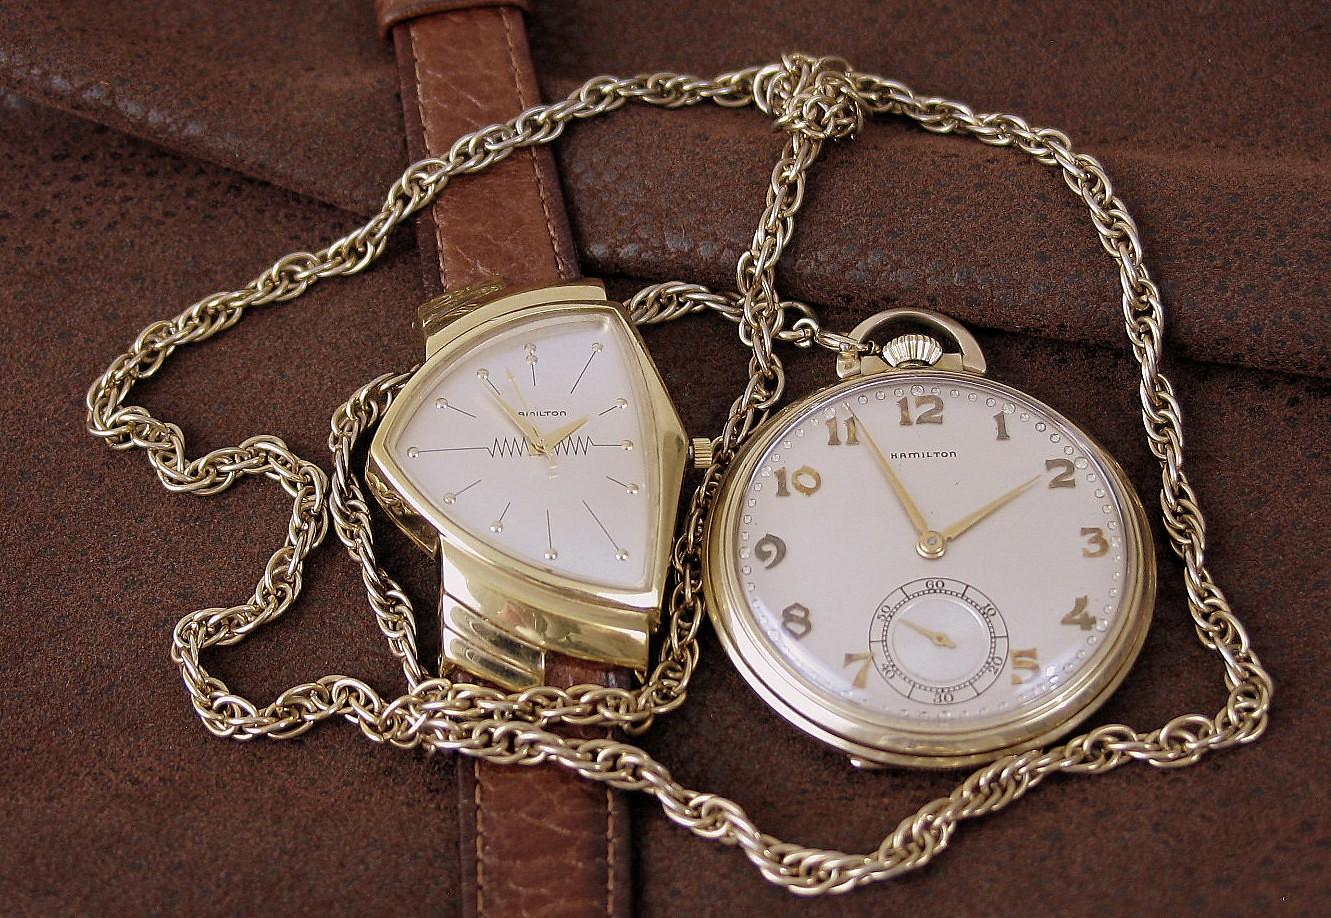 Карманные часы Hamilton конца 1920-х годов и Hamilton Ventura, первые часы на батарейках начала 1960-х годов.